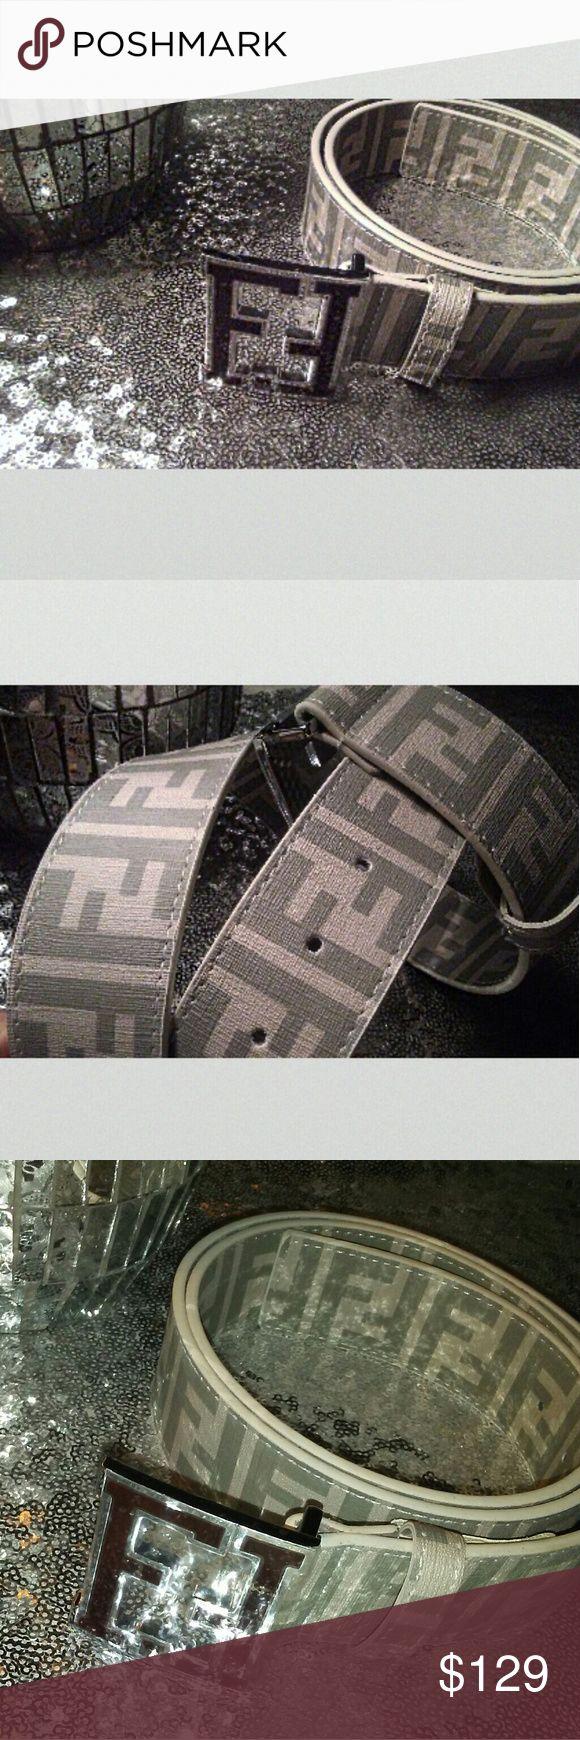 Fendi belt FF belt Zucca belt , Fendi women's belt. Men's Fendi belt. White belt. Beige belt. Silver belt. Grey belt. Luxury belt. 2016 belt. 2017 belt. Zucca belt. FF belt.  Men's Zucca. Fendi Accessories Belts